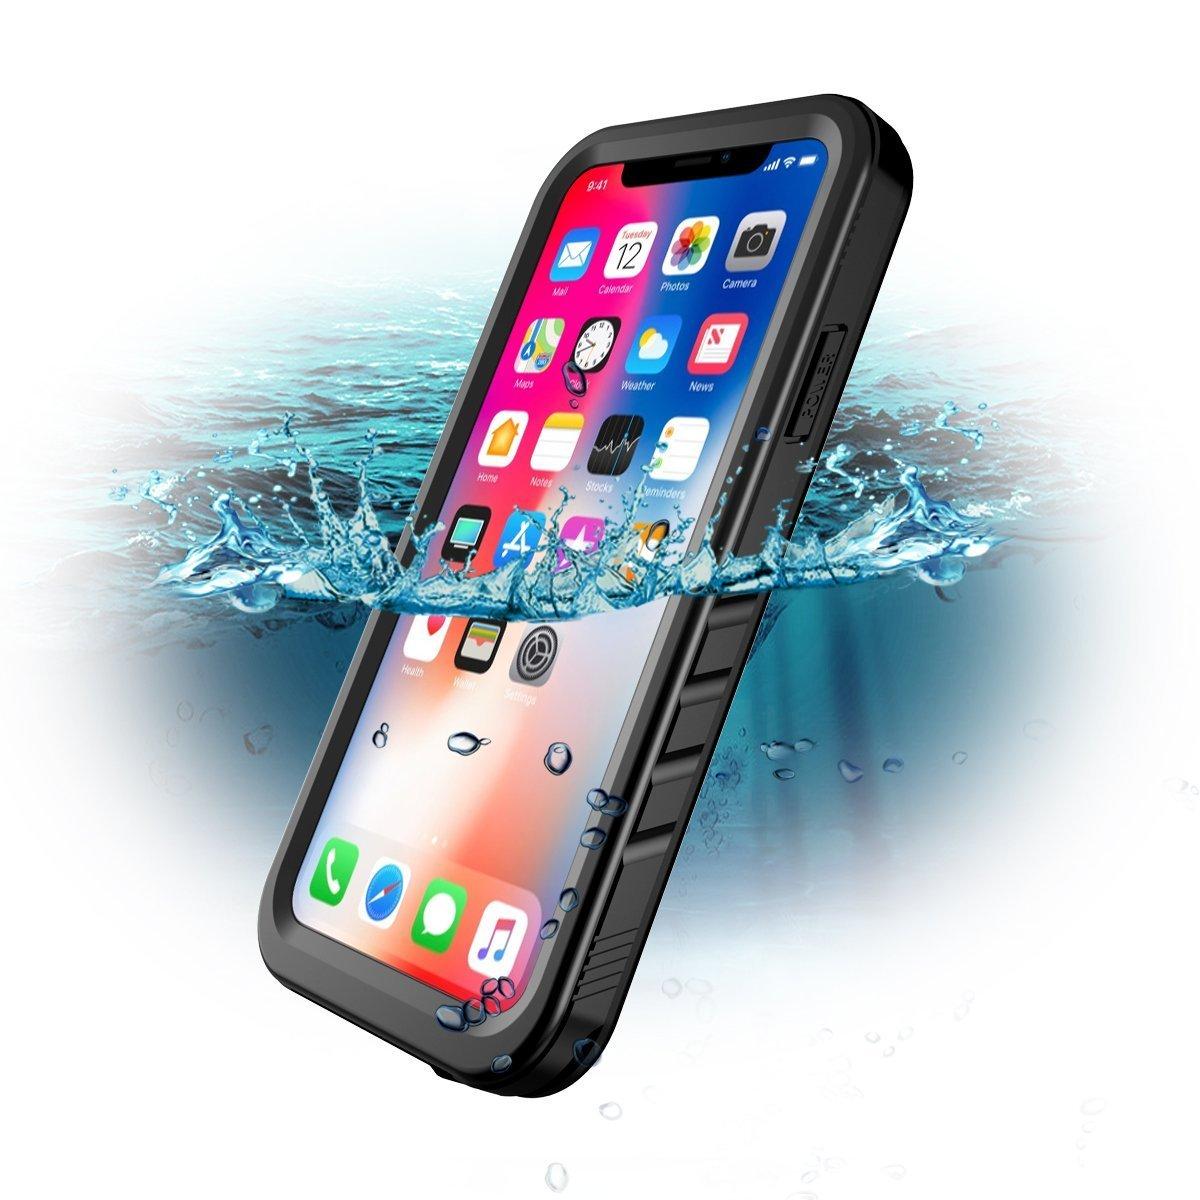 custodia subacquea iphone 6 apple